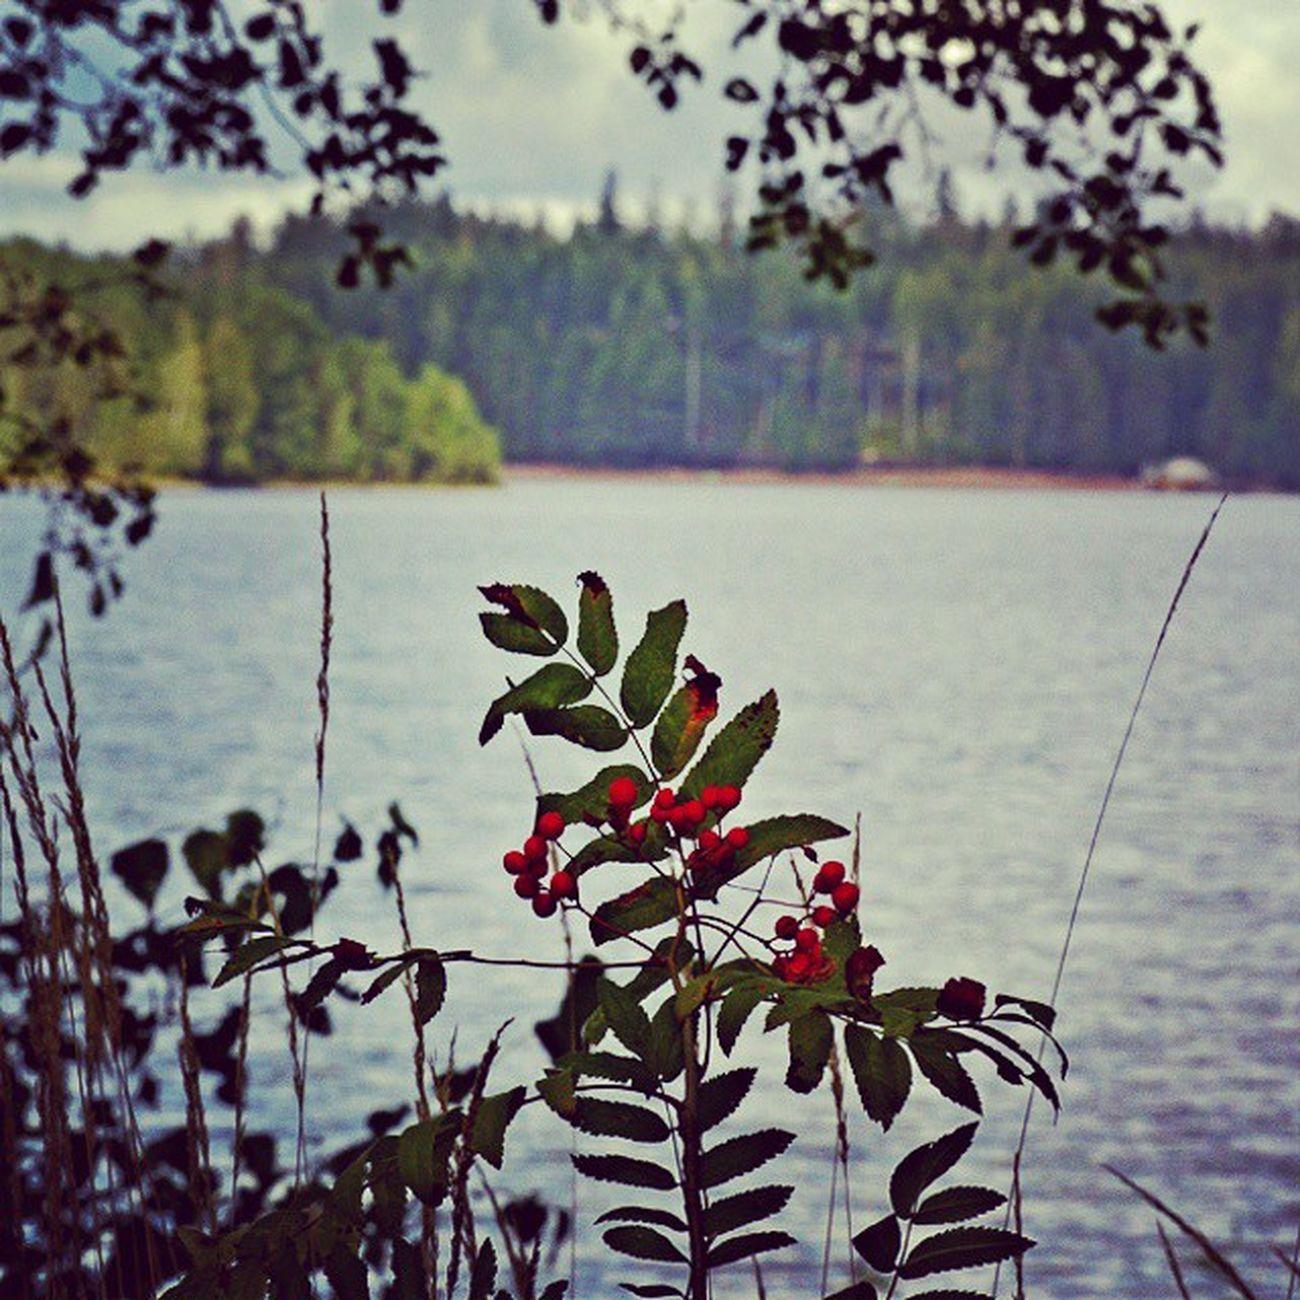 Finland Suomi Saimaa Bush berry lake Финляндия Саймаа озеро кусты